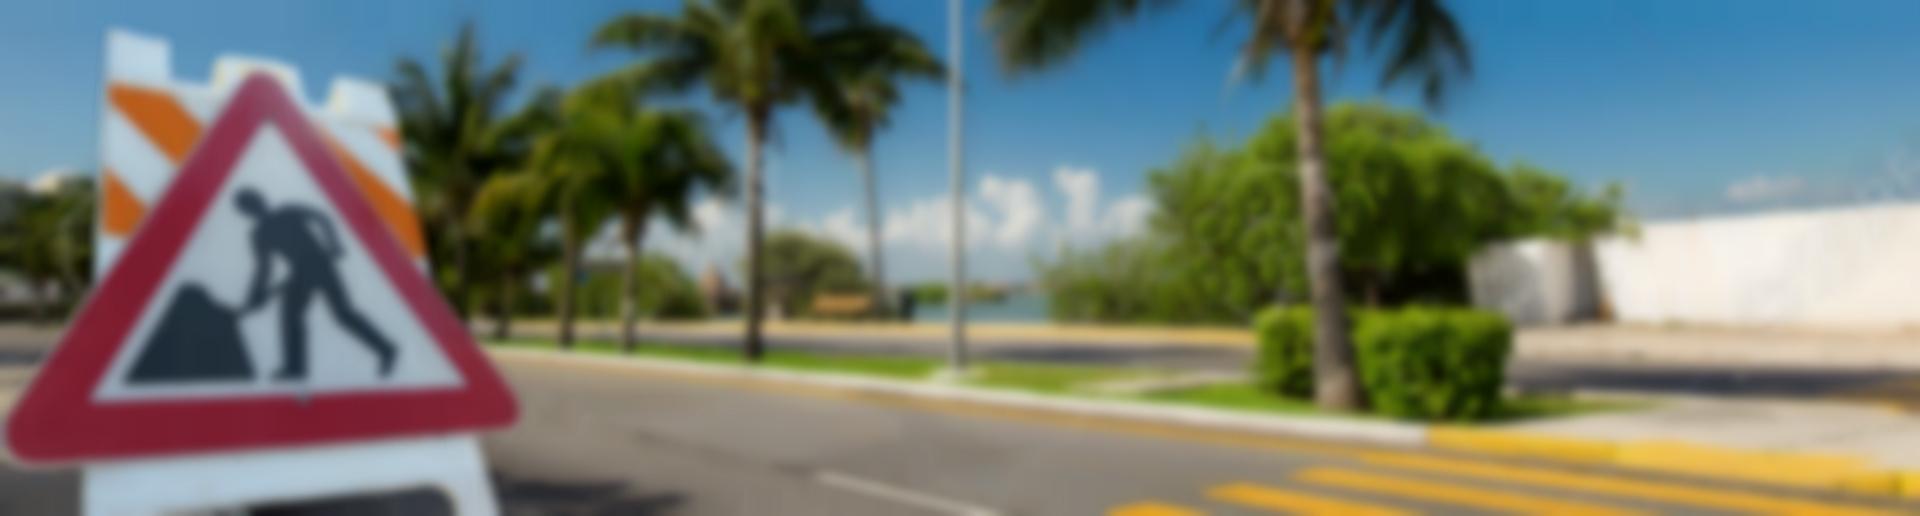 Planned Service Interruption: Tropical Gardens Area